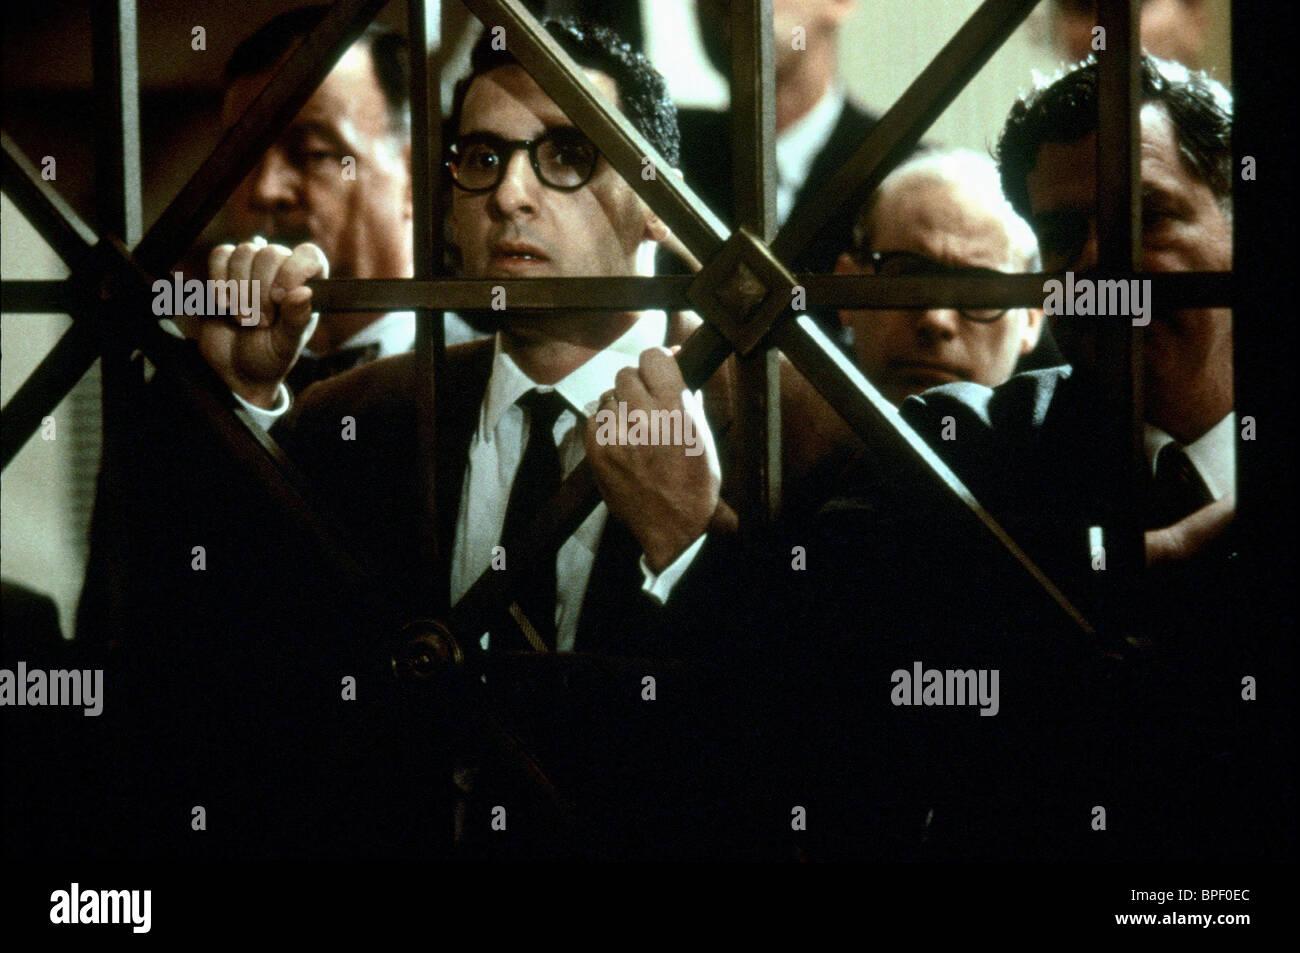 JOHN TURTURRO QUIZ SHOW (1994) - Stock Image